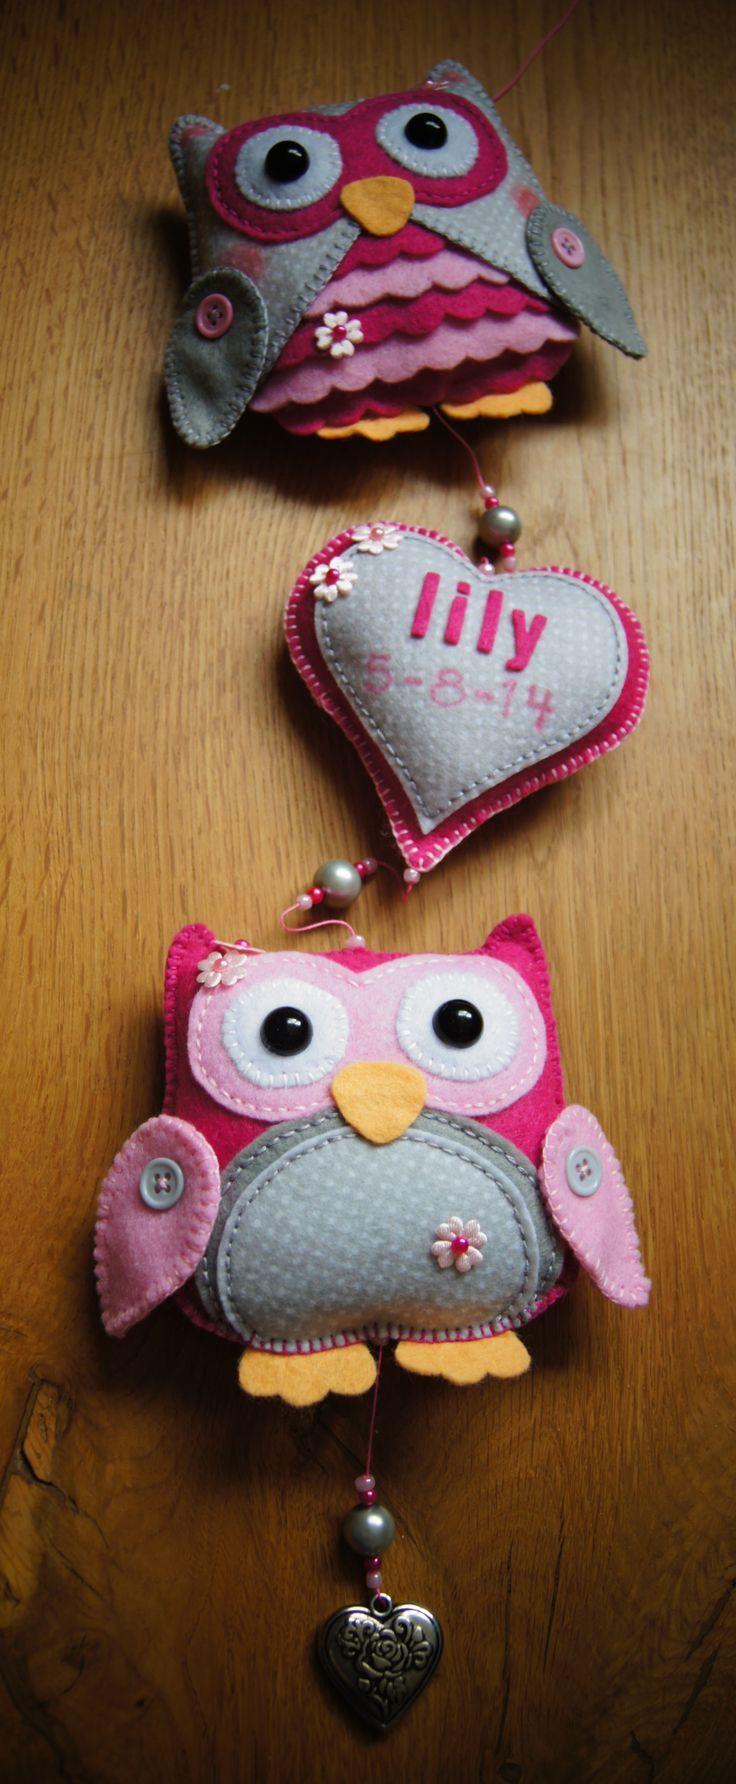 Handmade by JoHo - uilen van vilt kraamcadeau - felt owl